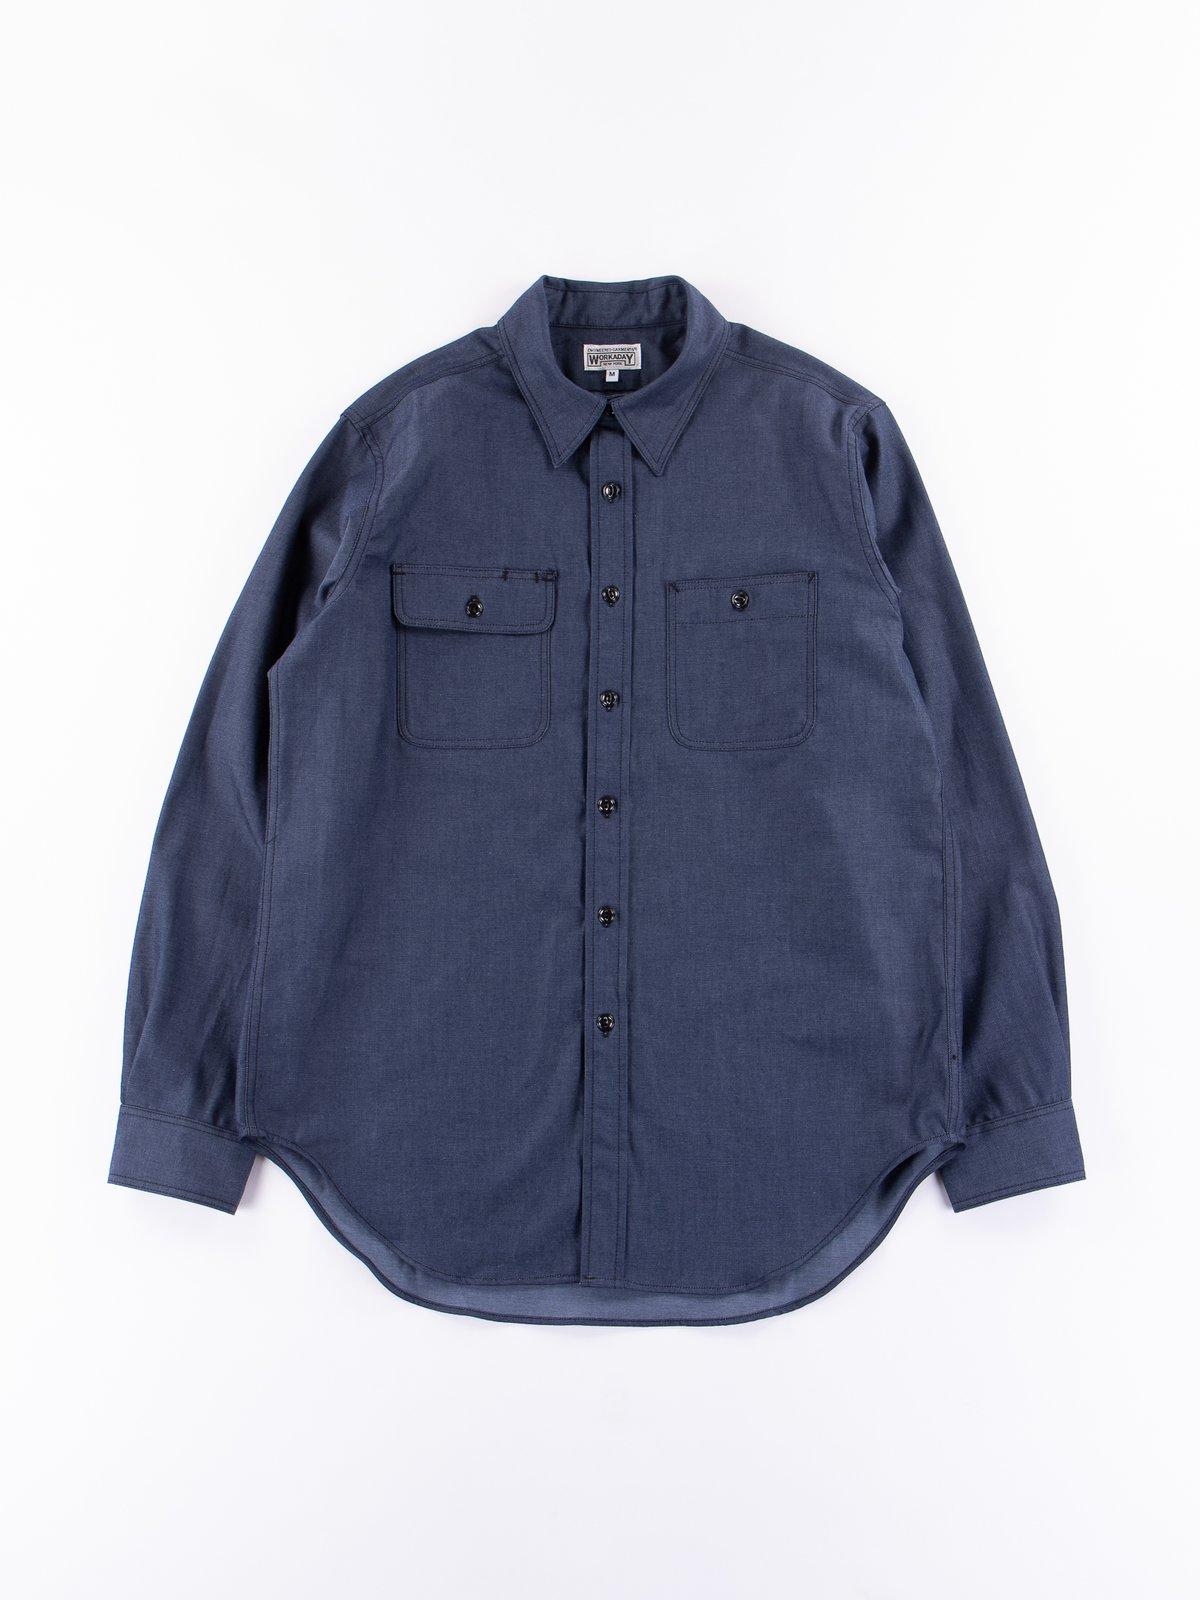 Indigo Cotton Denim Utility Shirt - Image 1